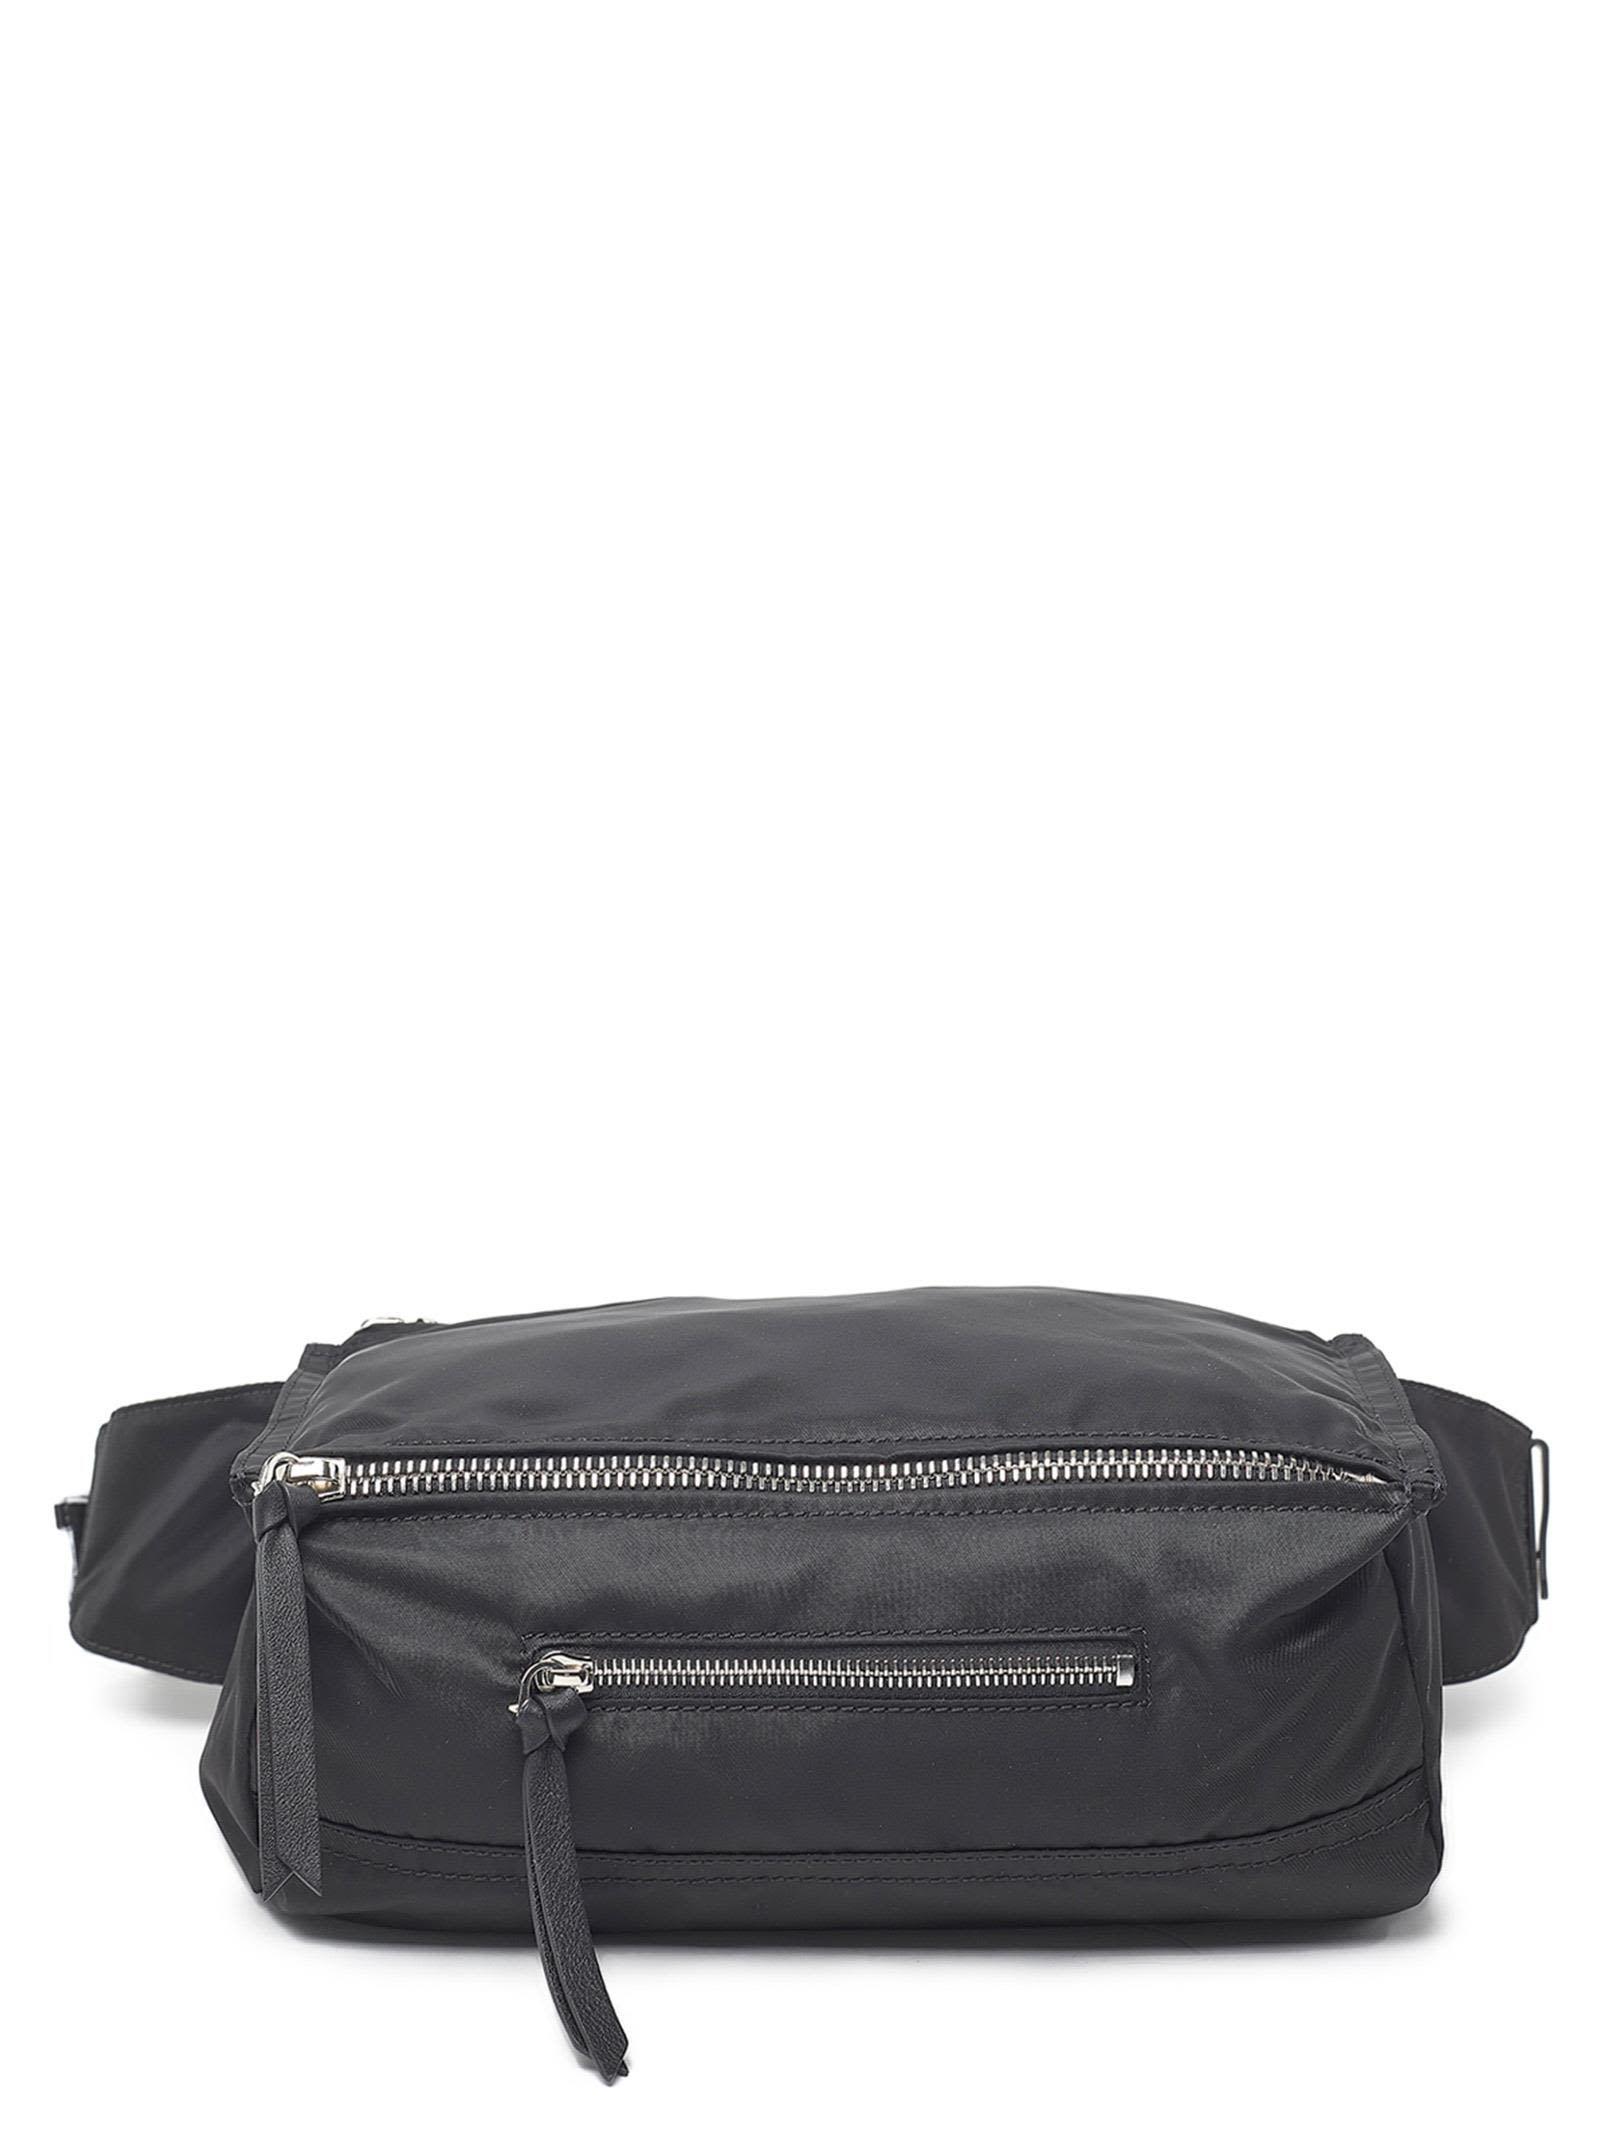 e9c68f69cf2f GIVENCHY PANDORA BAG.  givenchy  bags  belt bags  nylon